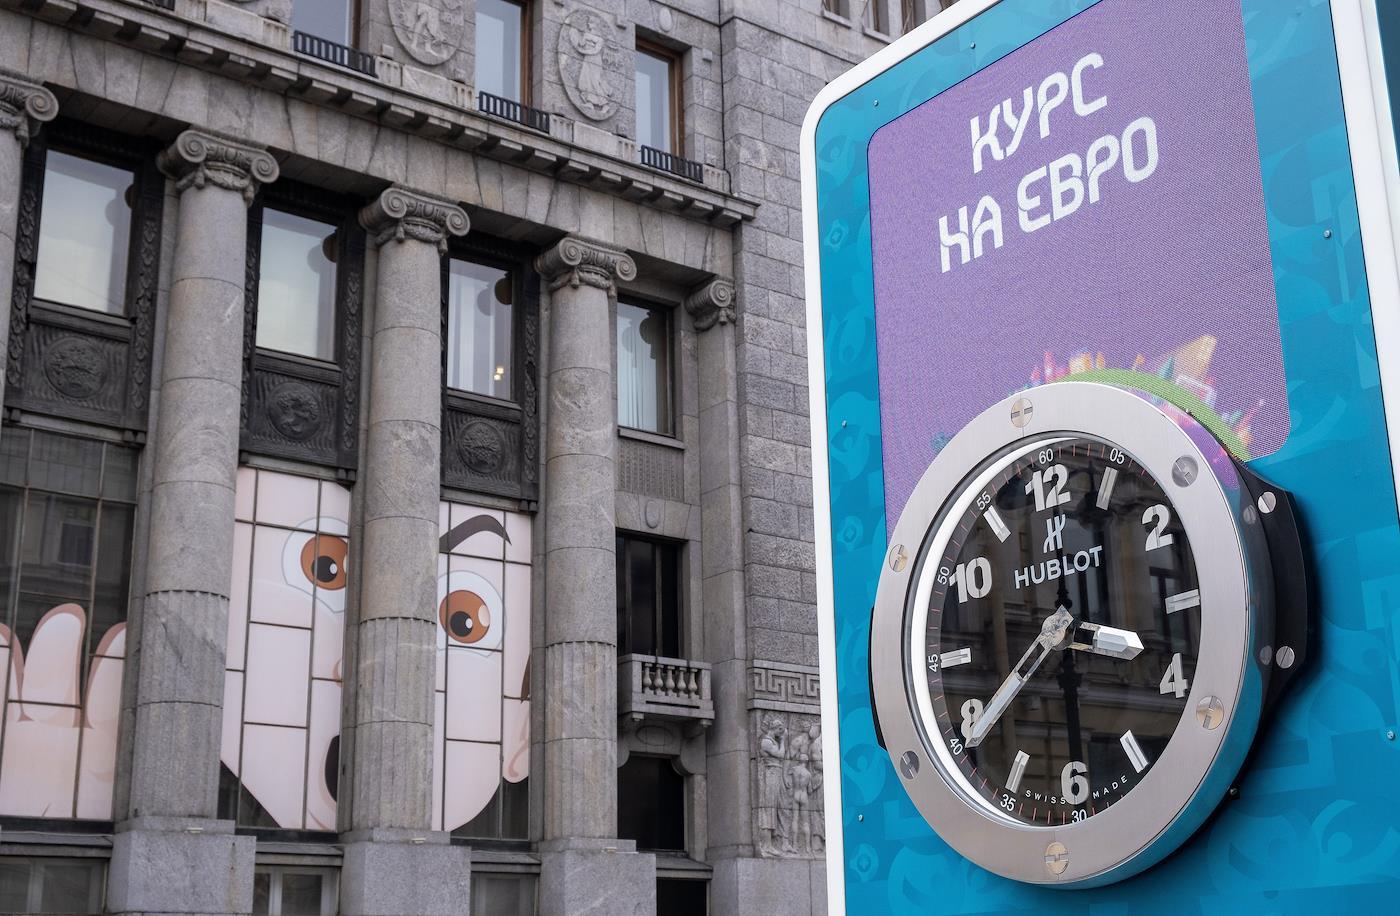 автор фото Алексей Смагин/Коммерсантъ